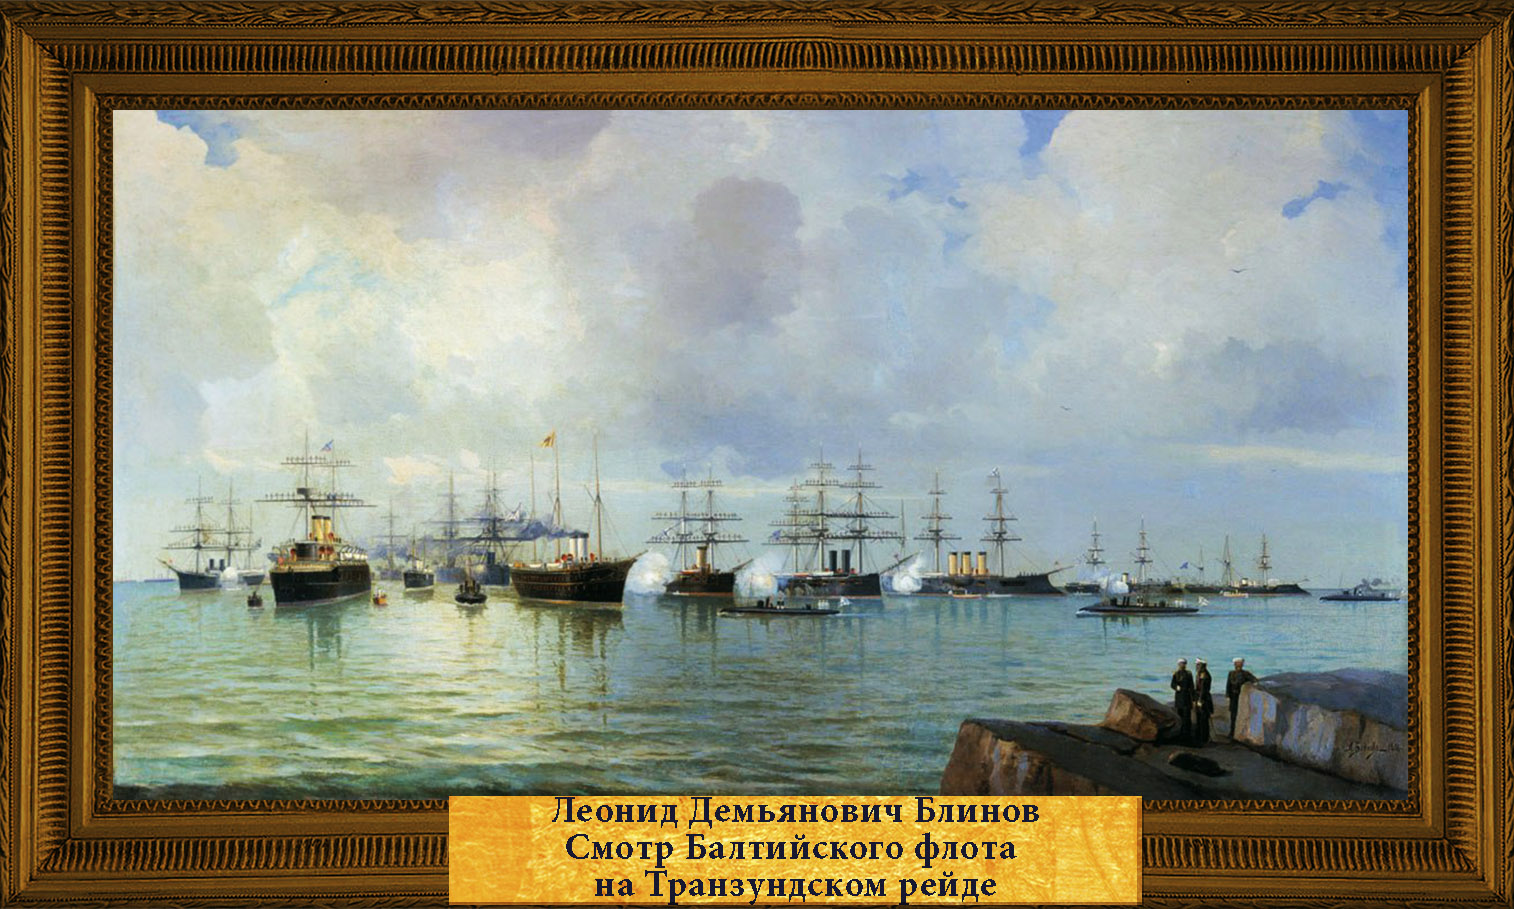 Смотр Балтийского флота на Транзундском рейде